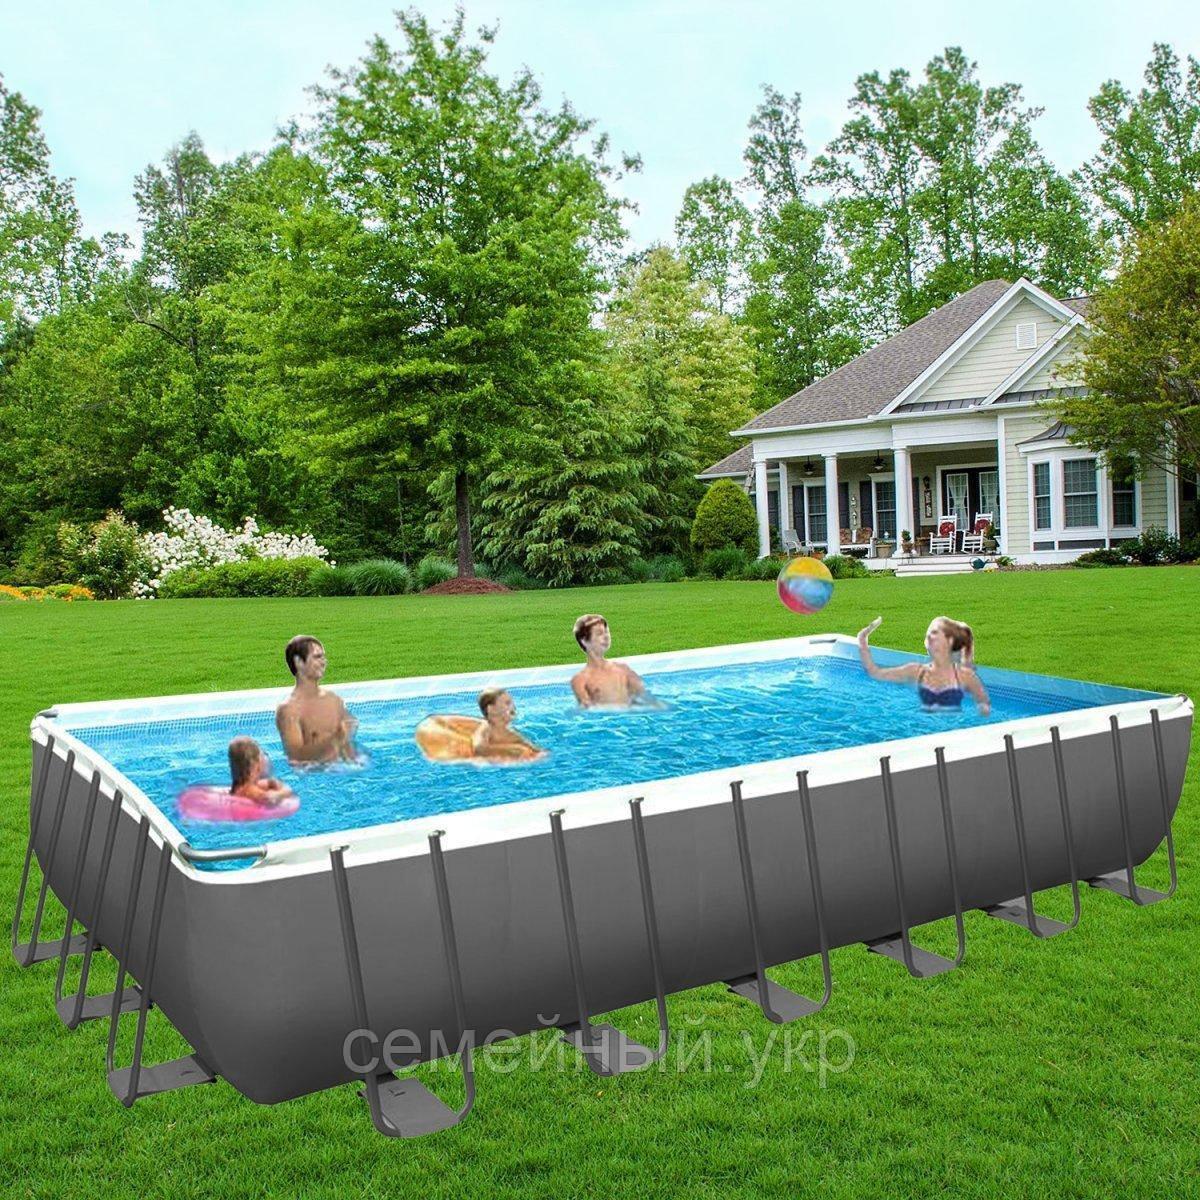 Каркасный бассейн Intex. ДхШхВ: 732х366х132 см. Вес: 185 кг. Лестница, насос-фильтр. Трехслойный ПВХ